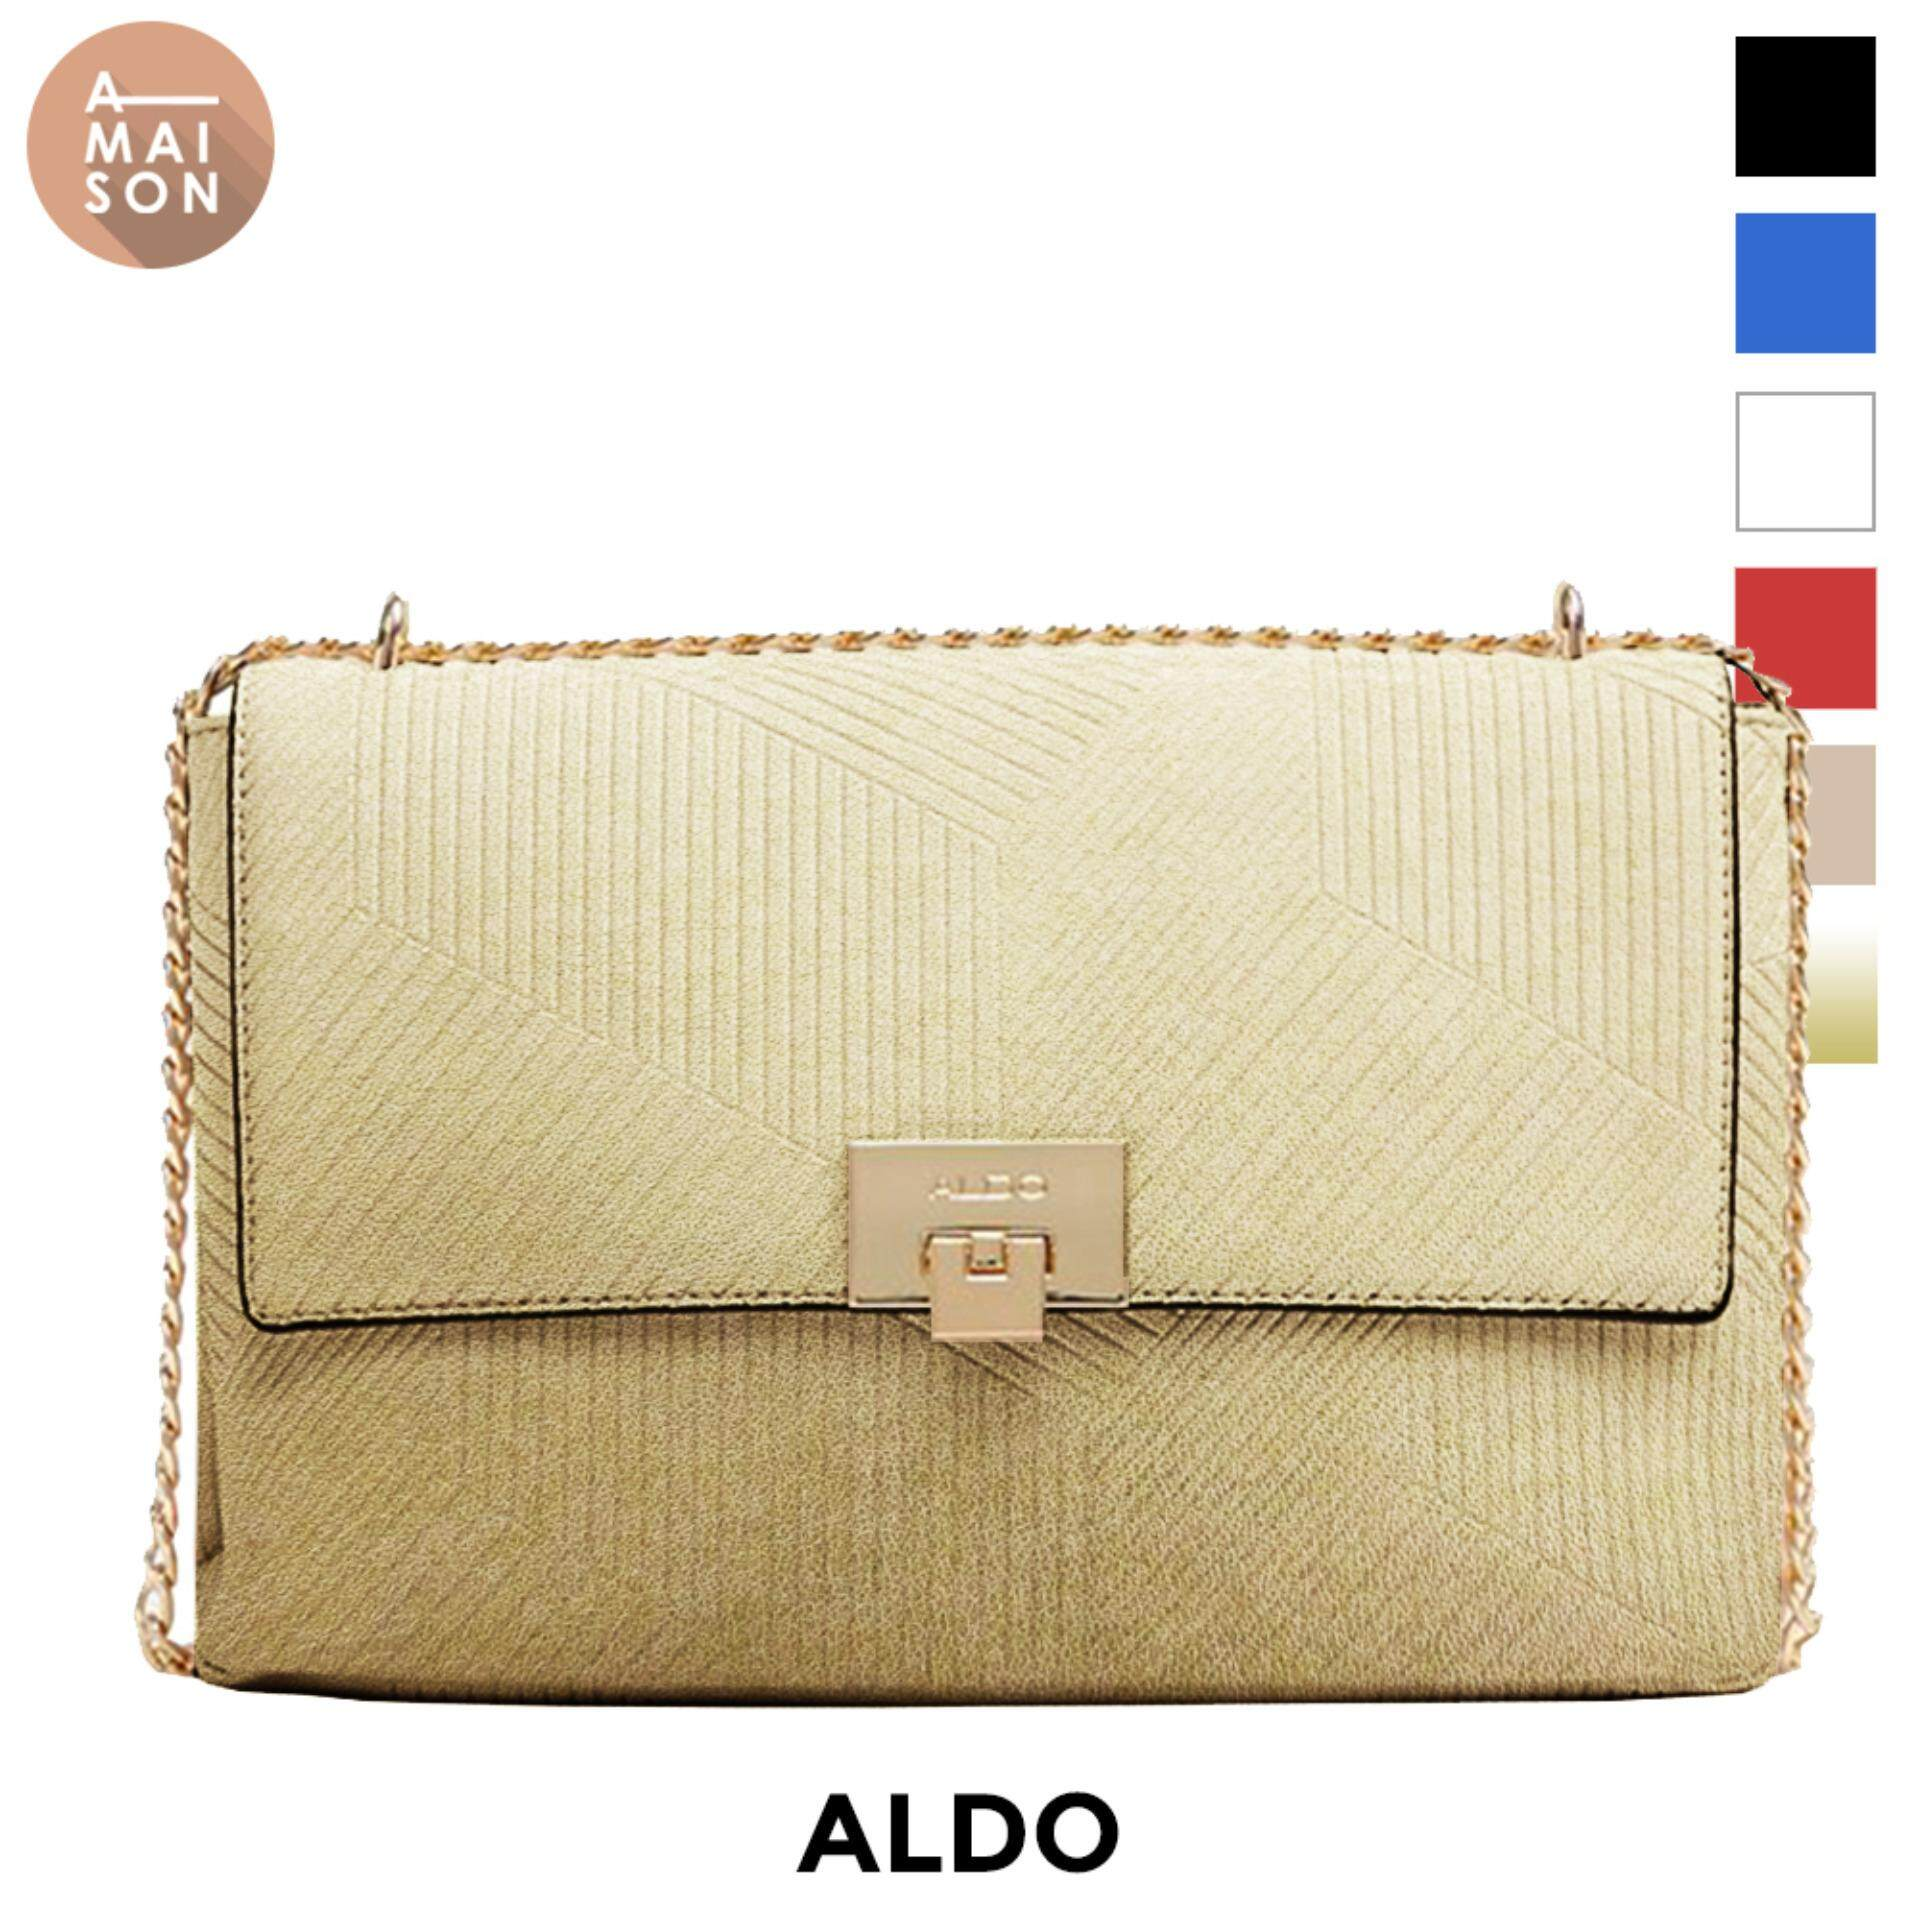 ec4afc38c13 Authentic Aldo Fair Textured Elegant Keylock Closure Evening Crossbody Messenger  Sling Shoulder Bag Handbag